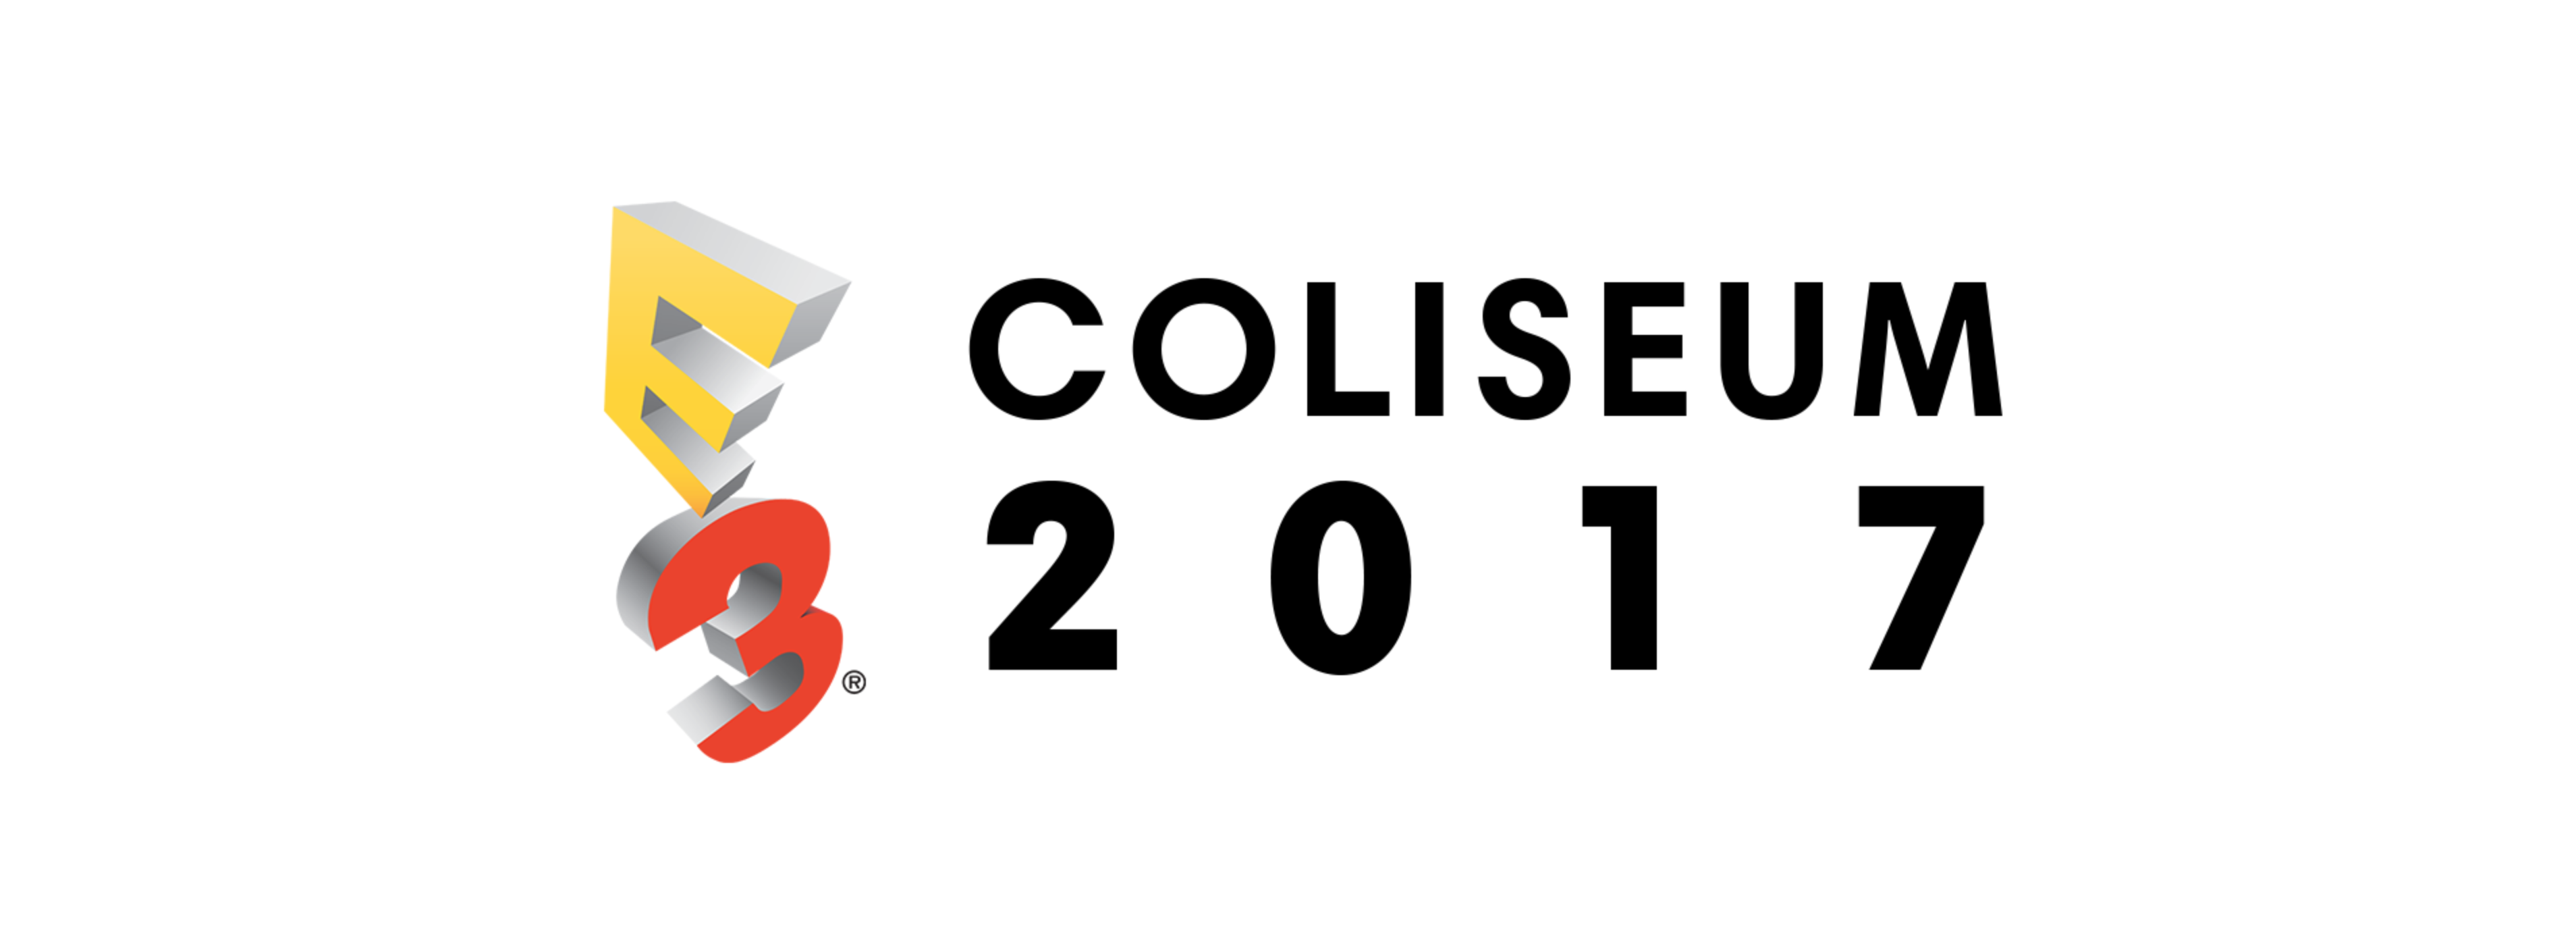 Next Assassin's Creed Sneak-Peek at E3 Coliseum